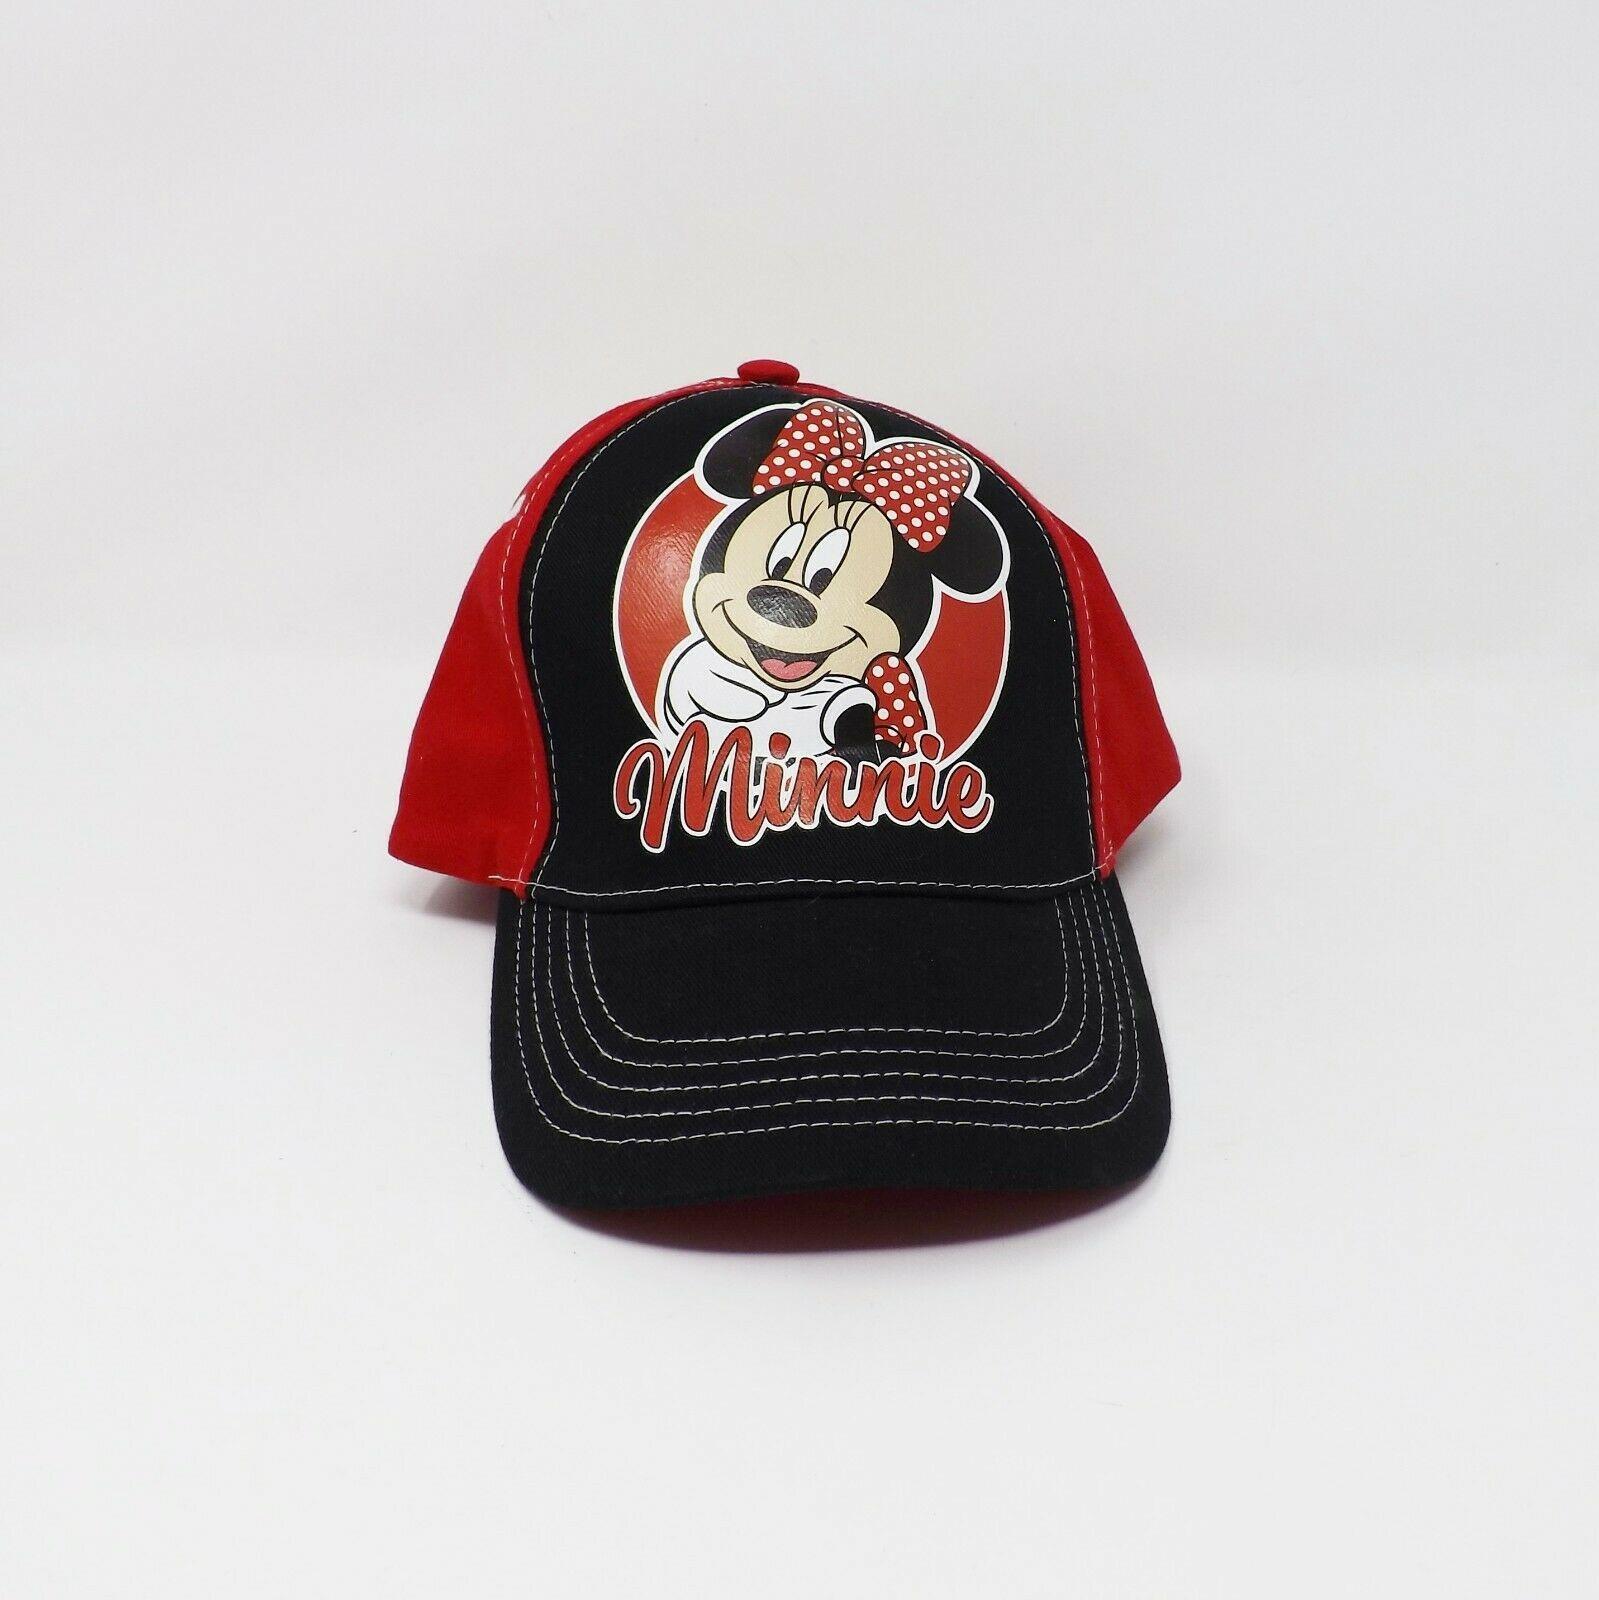 Child's Disney Minnie Mouse Red / Black Baseball Cap - New